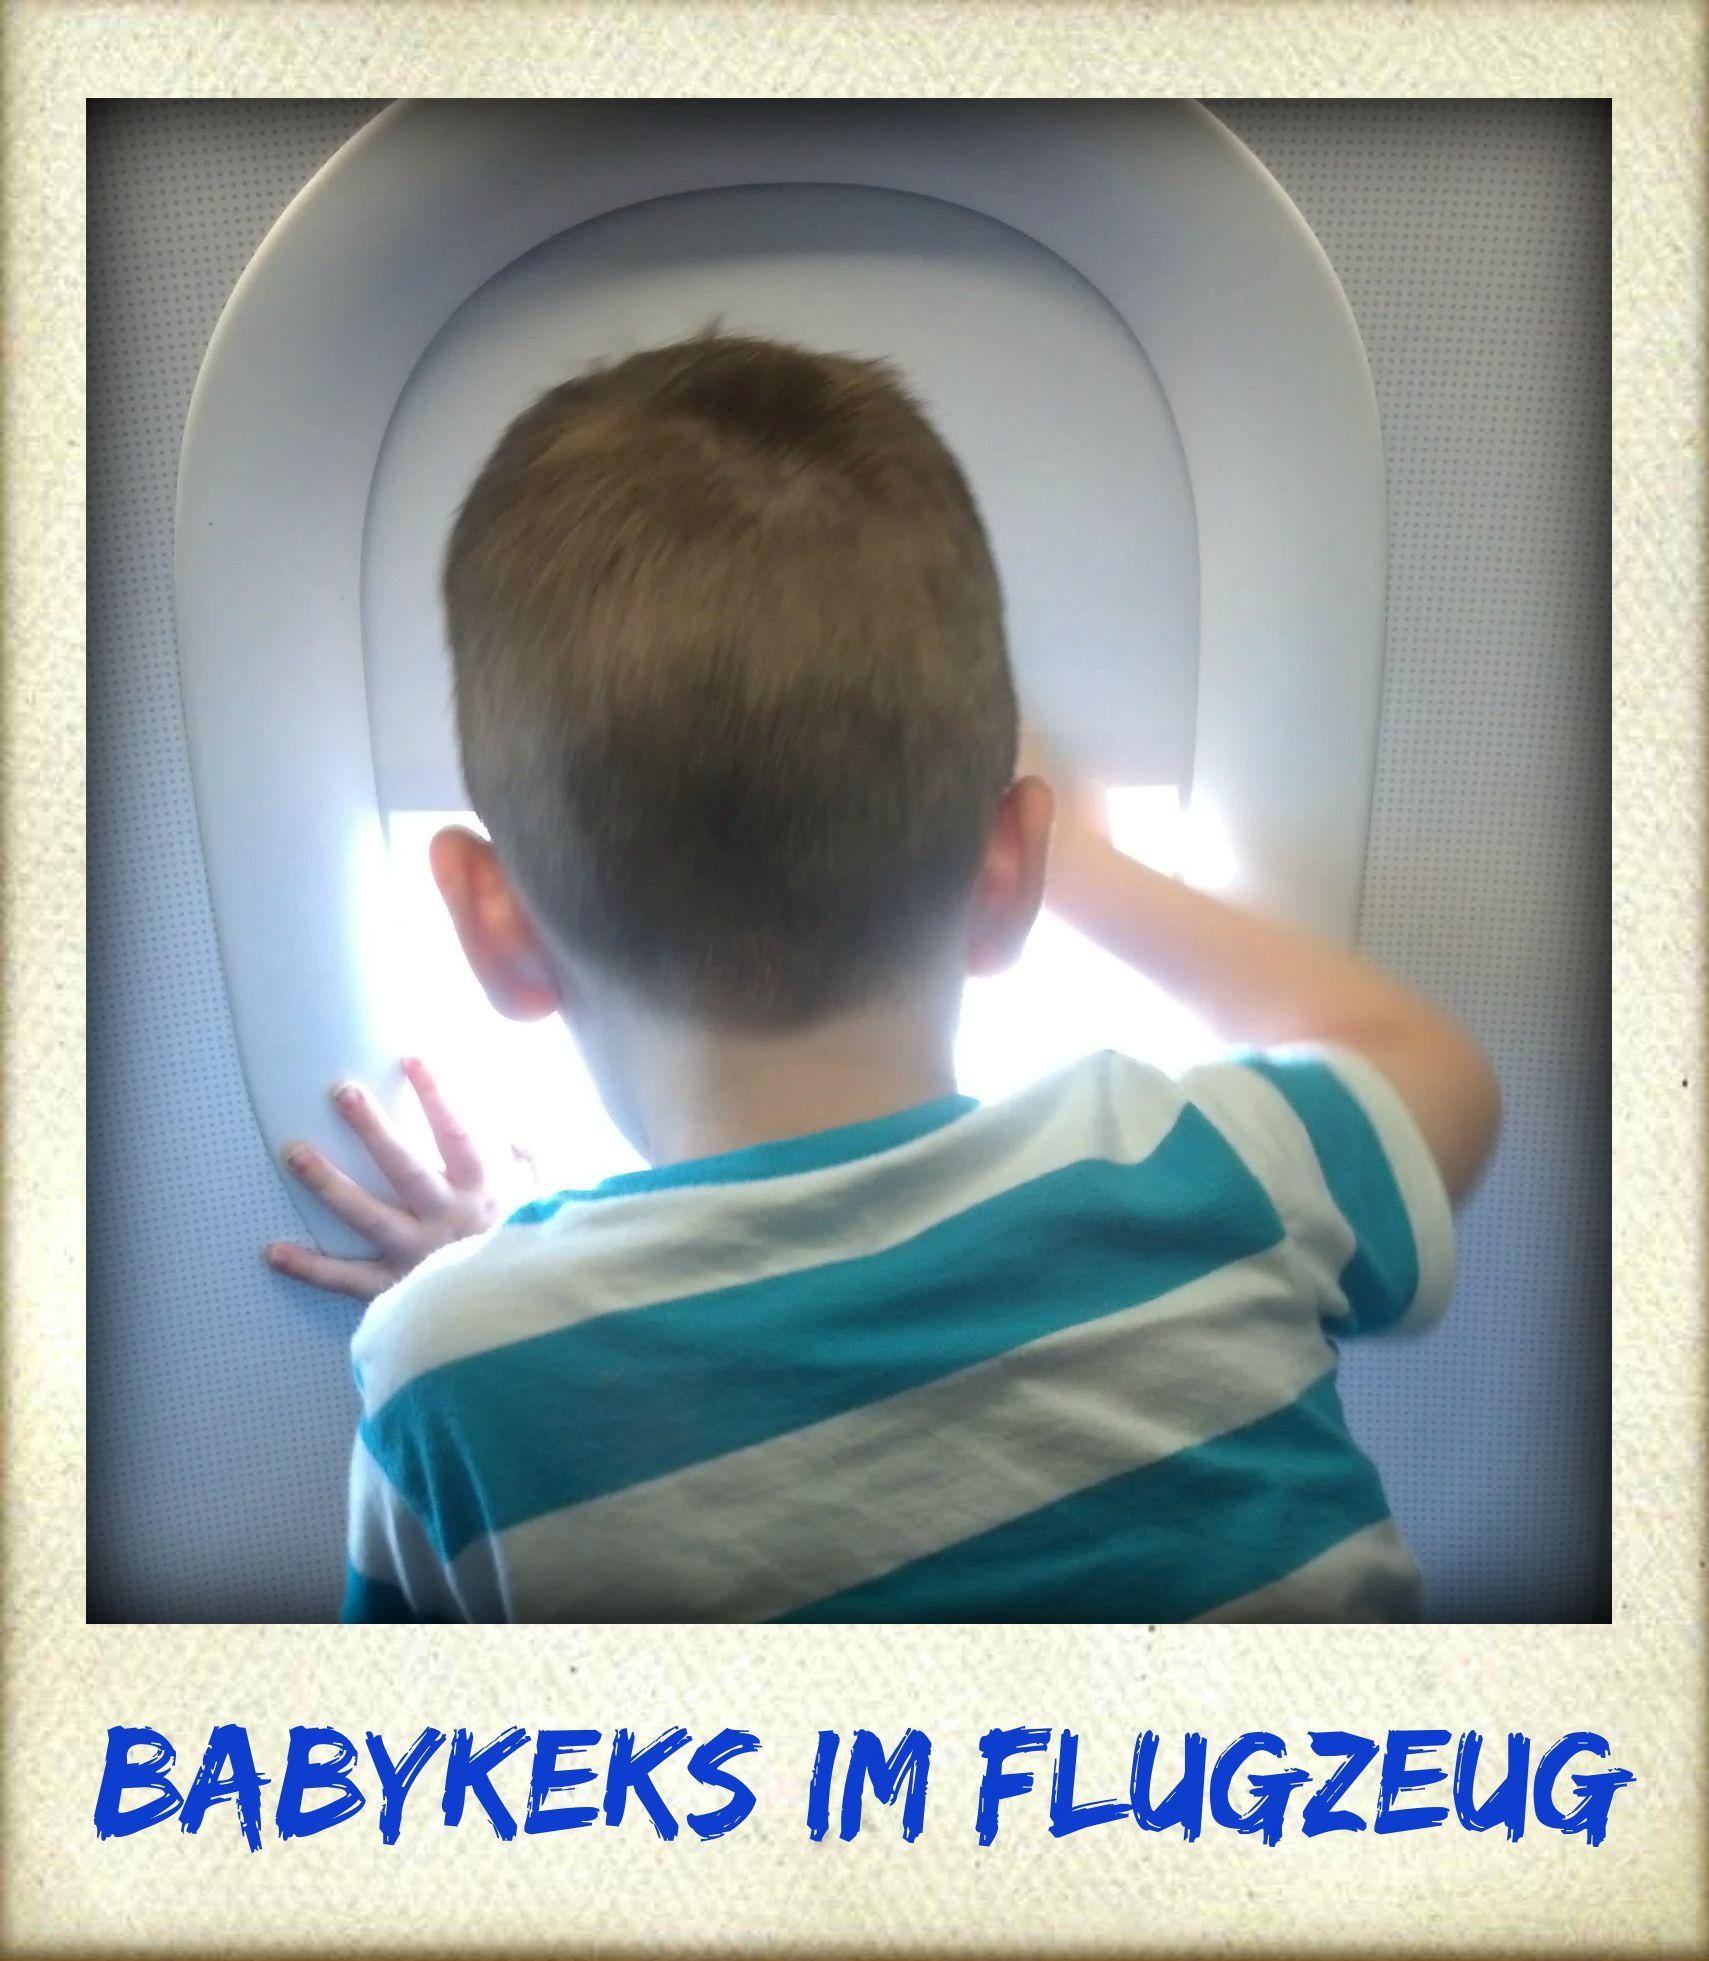 BabykeksimFlugzeug.jpg